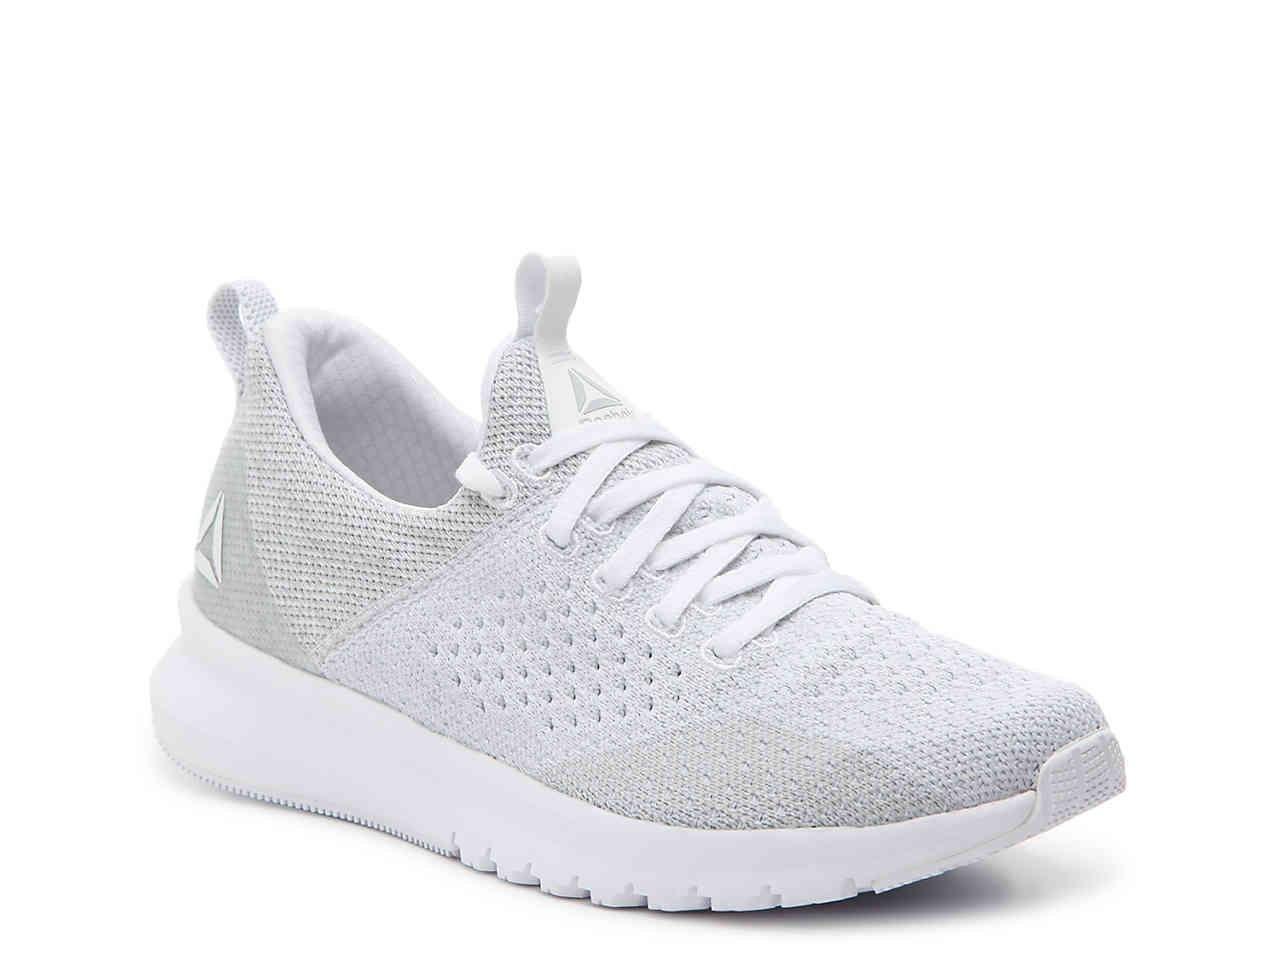 d0b7cd36d5d Lyst - Reebok Zprint Premier Ultraknit Lightweight Runing Shoe in White